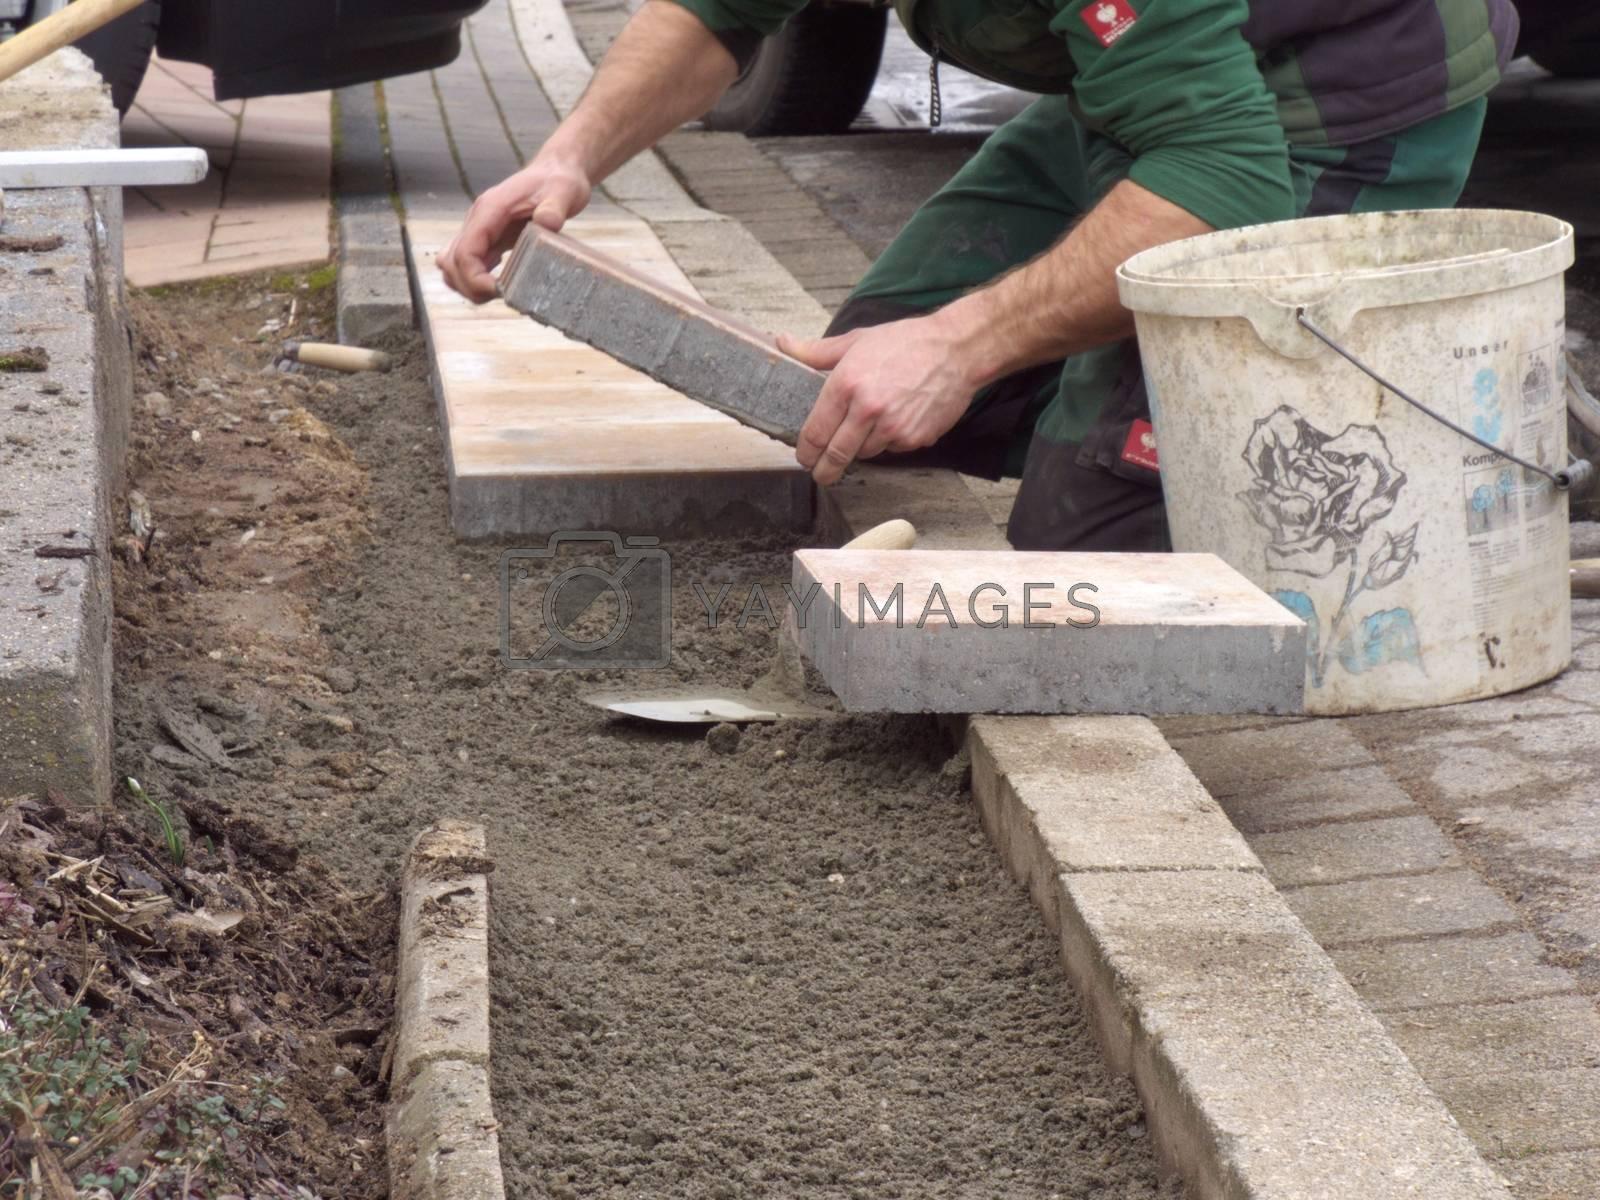 Paving stones laid